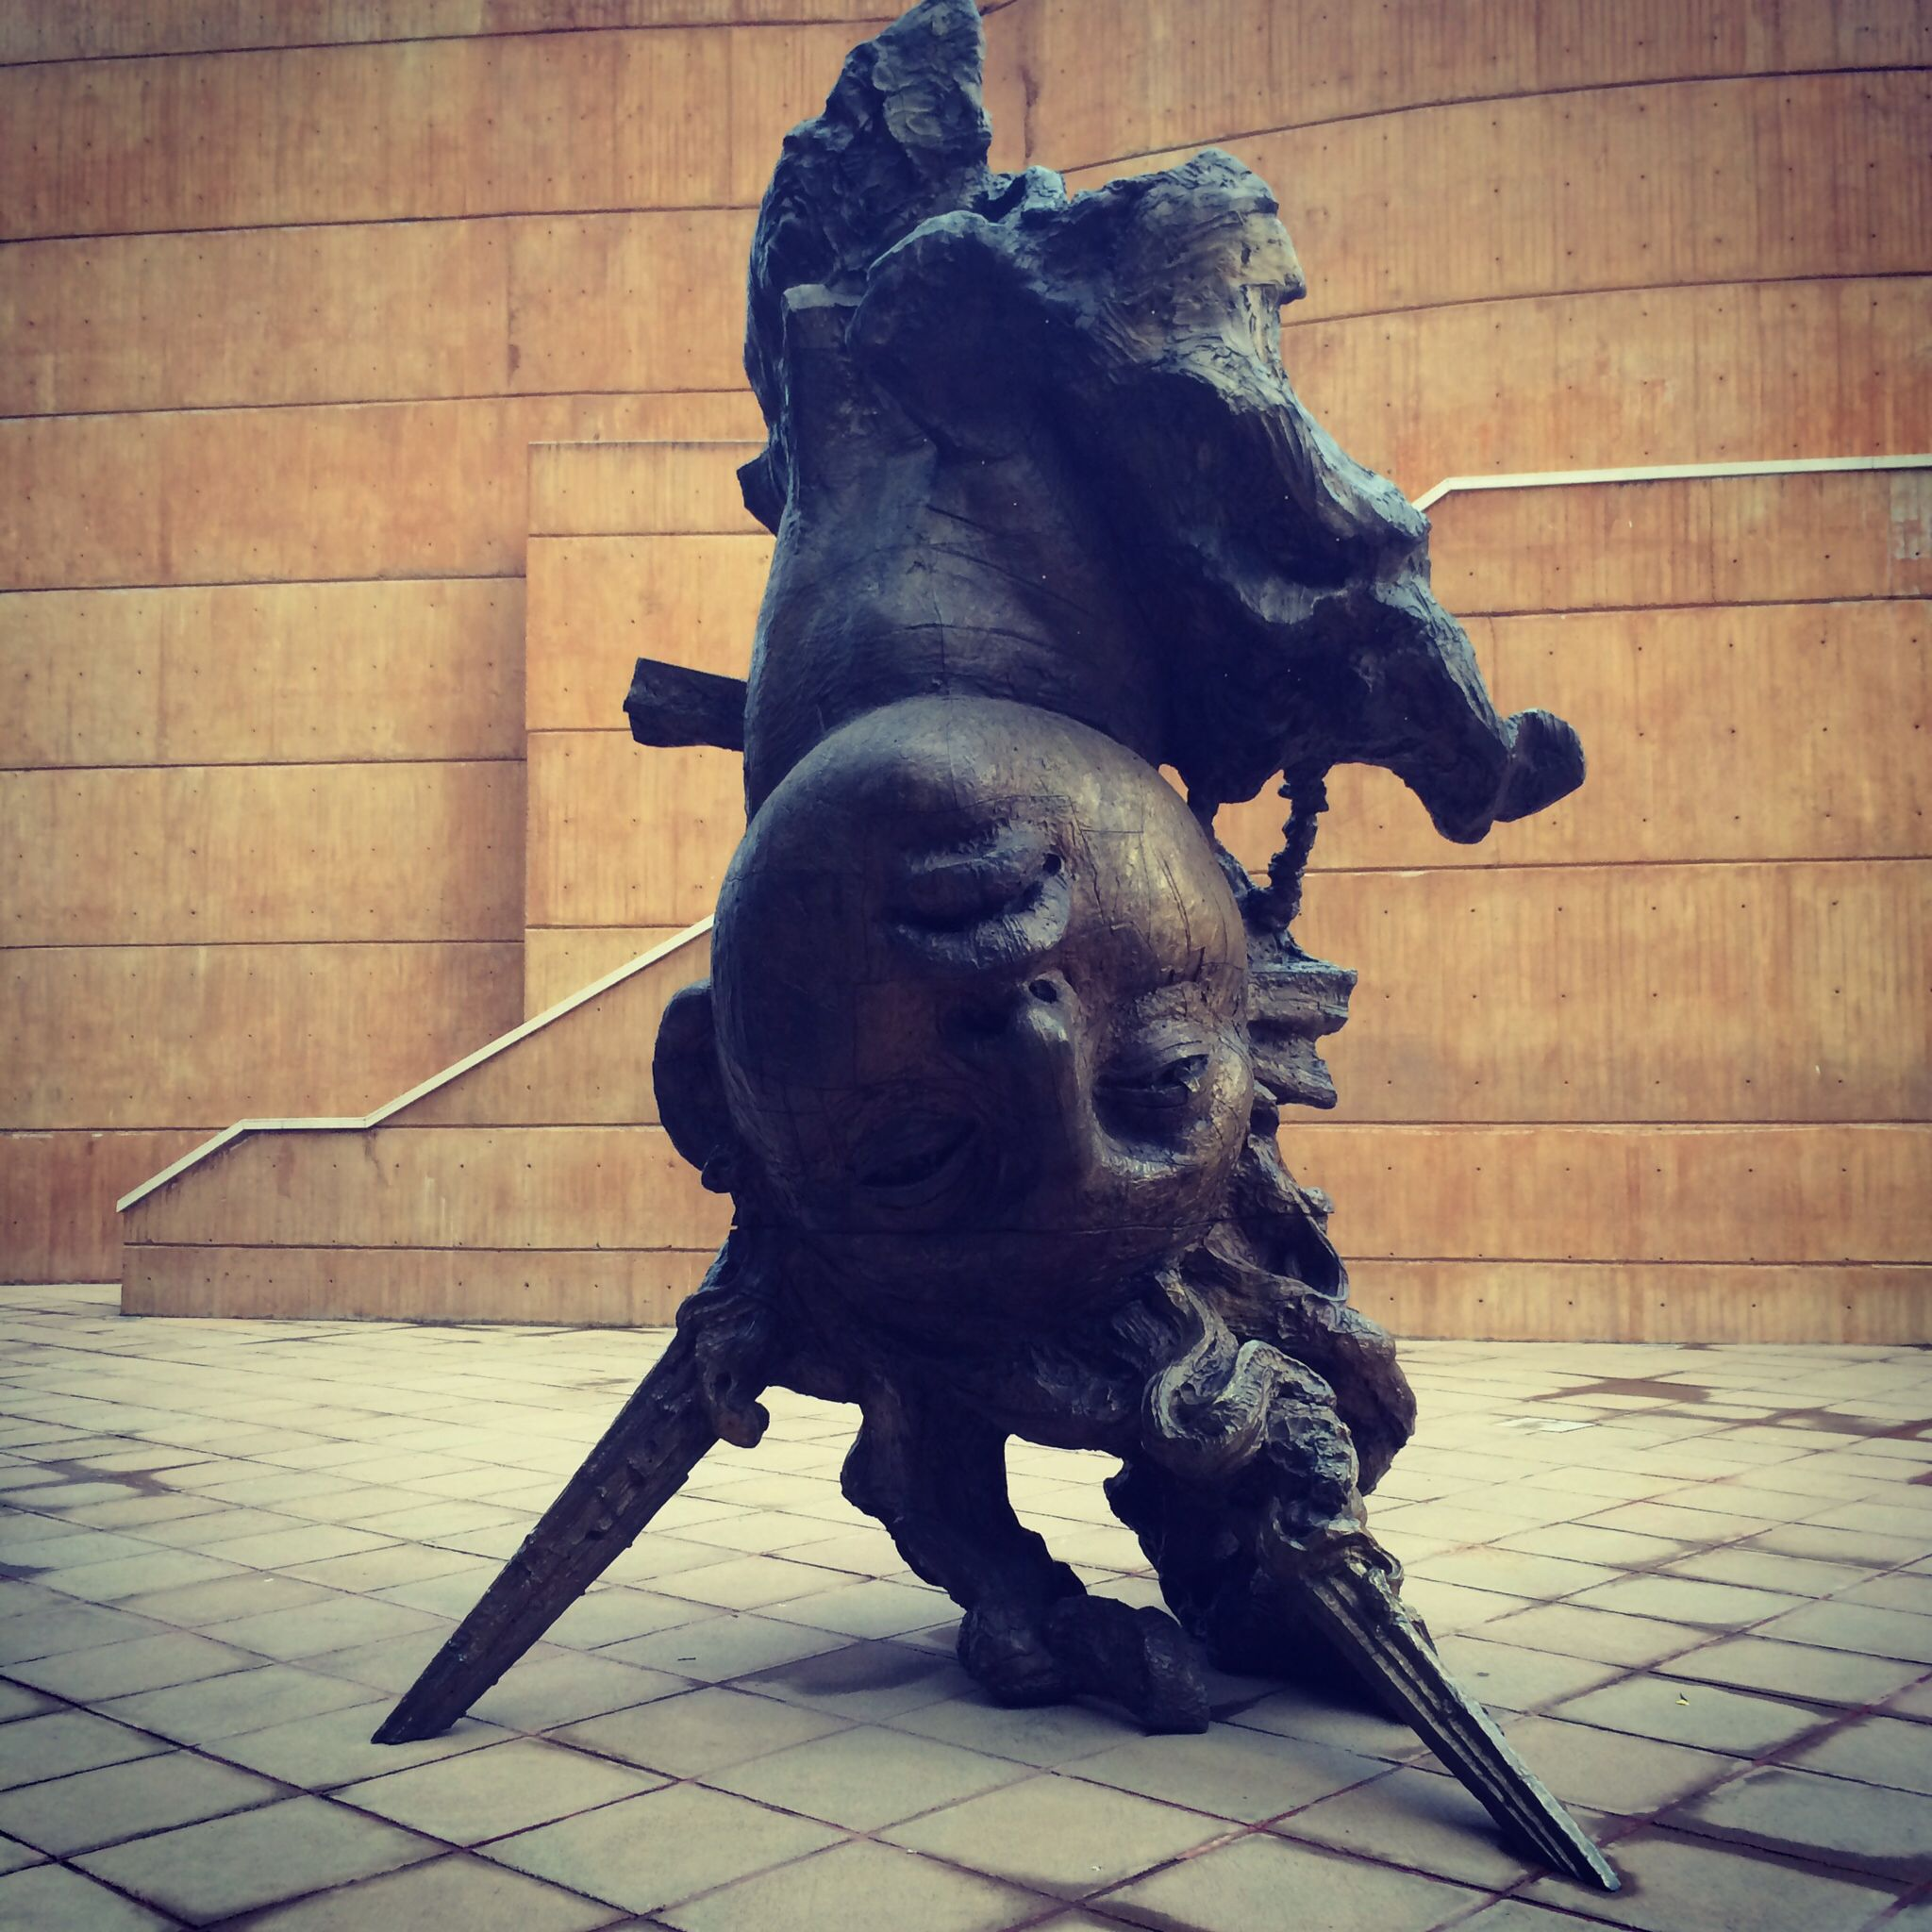 Tres Esculturas Monumentales | Javier Marín